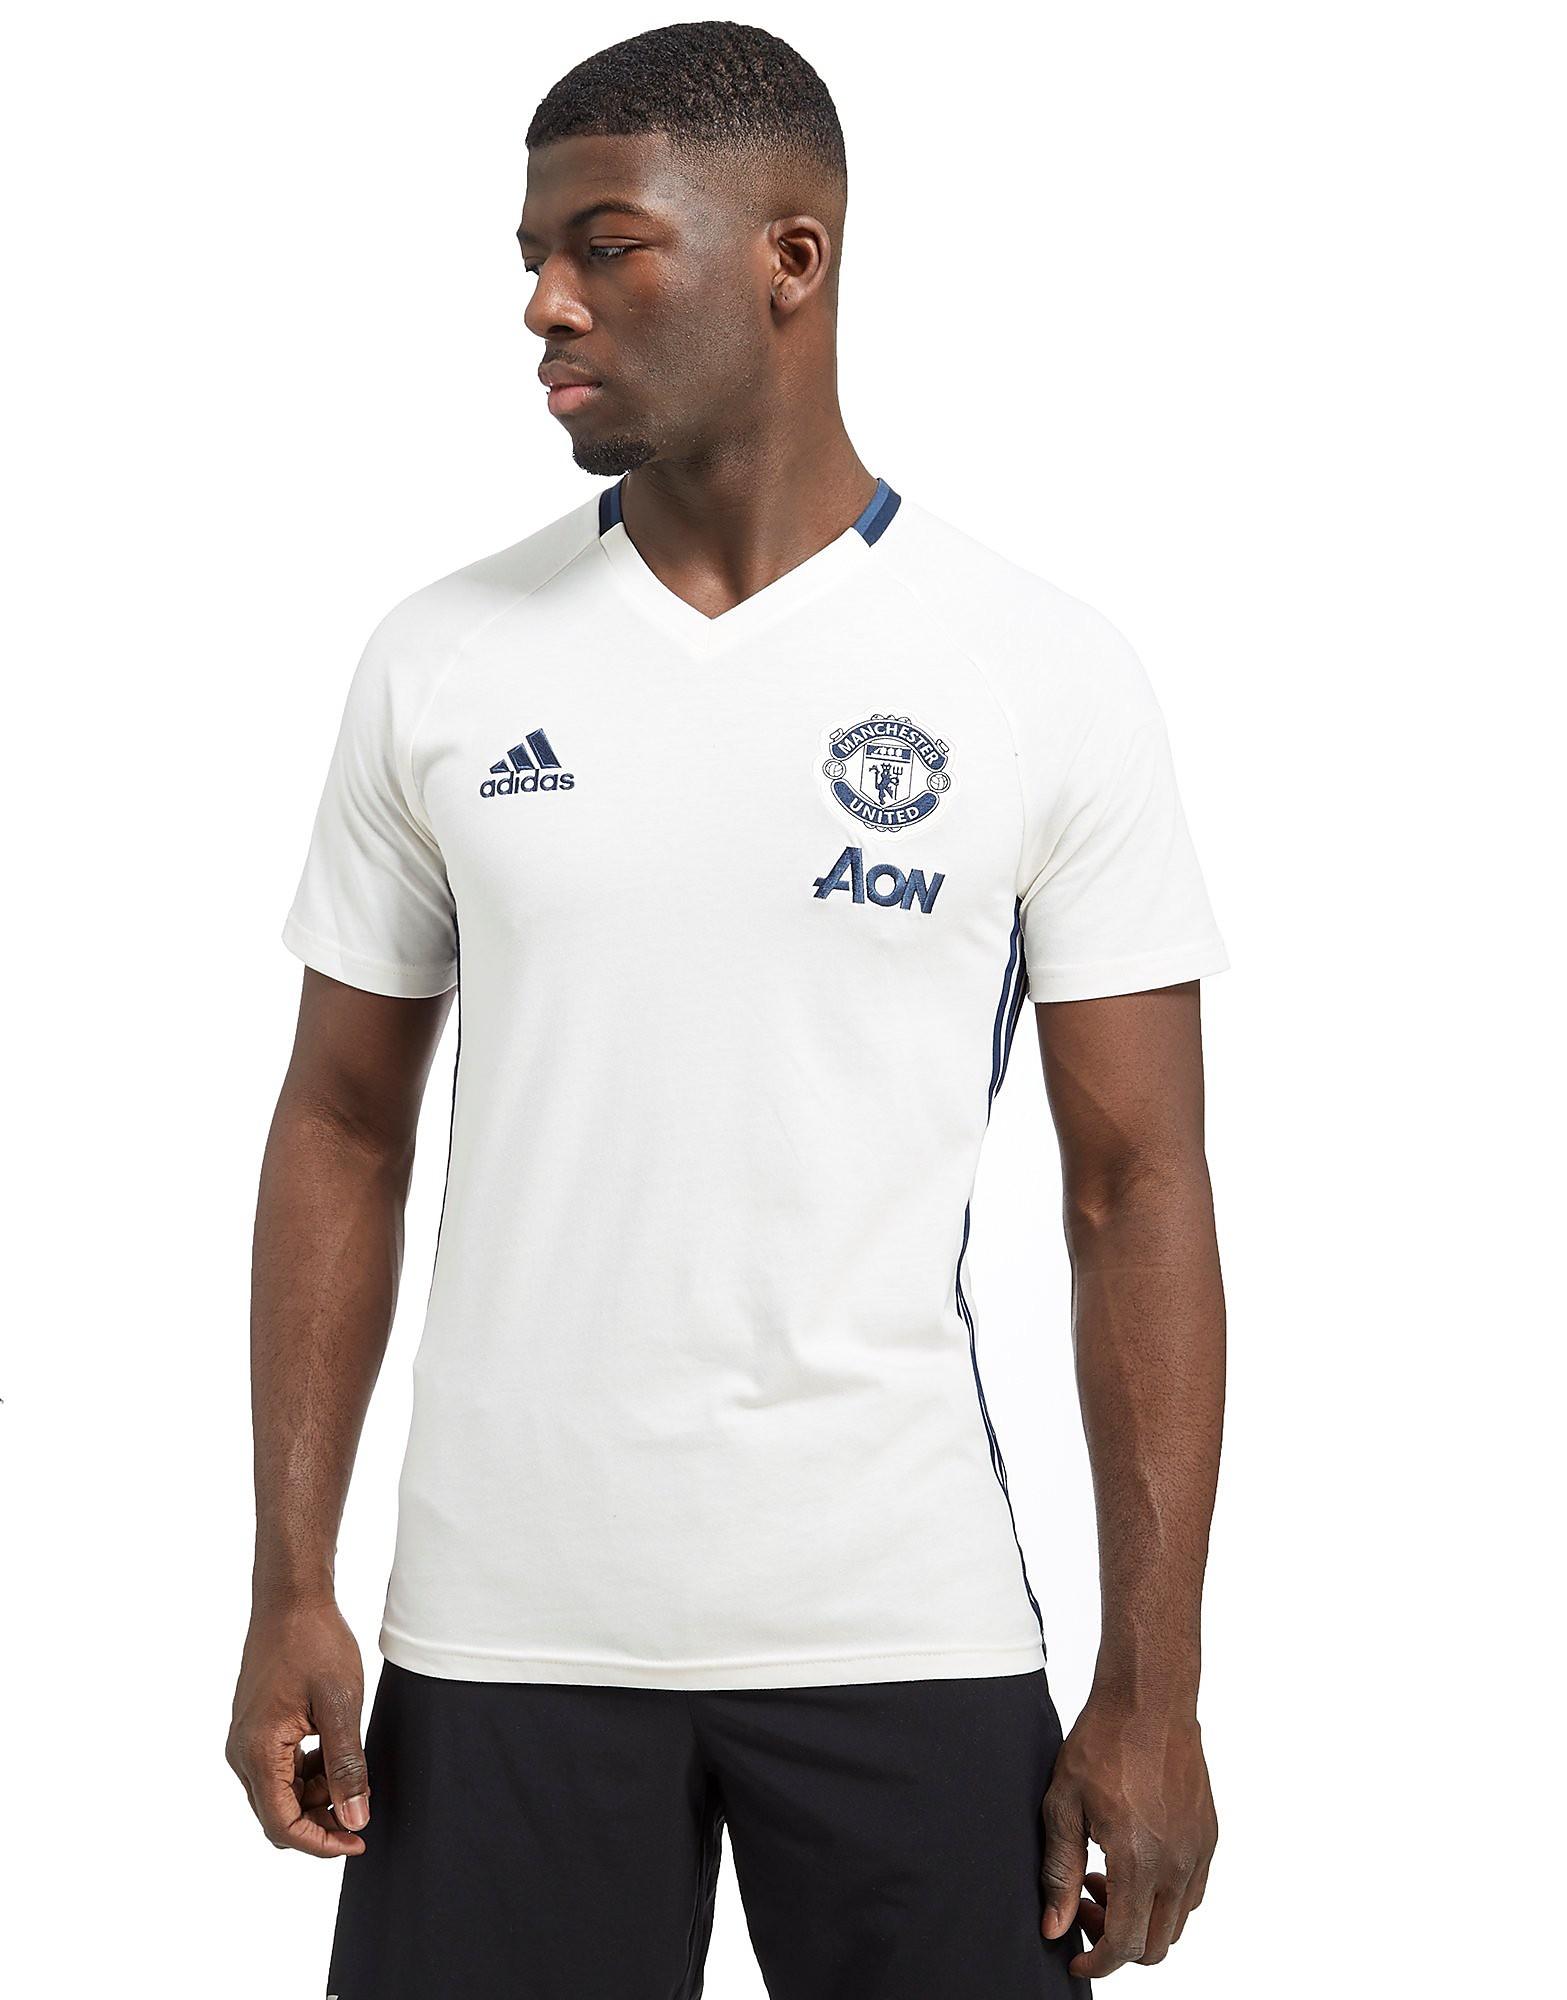 adidas Manchester United FC 2016/17 Training Shirt